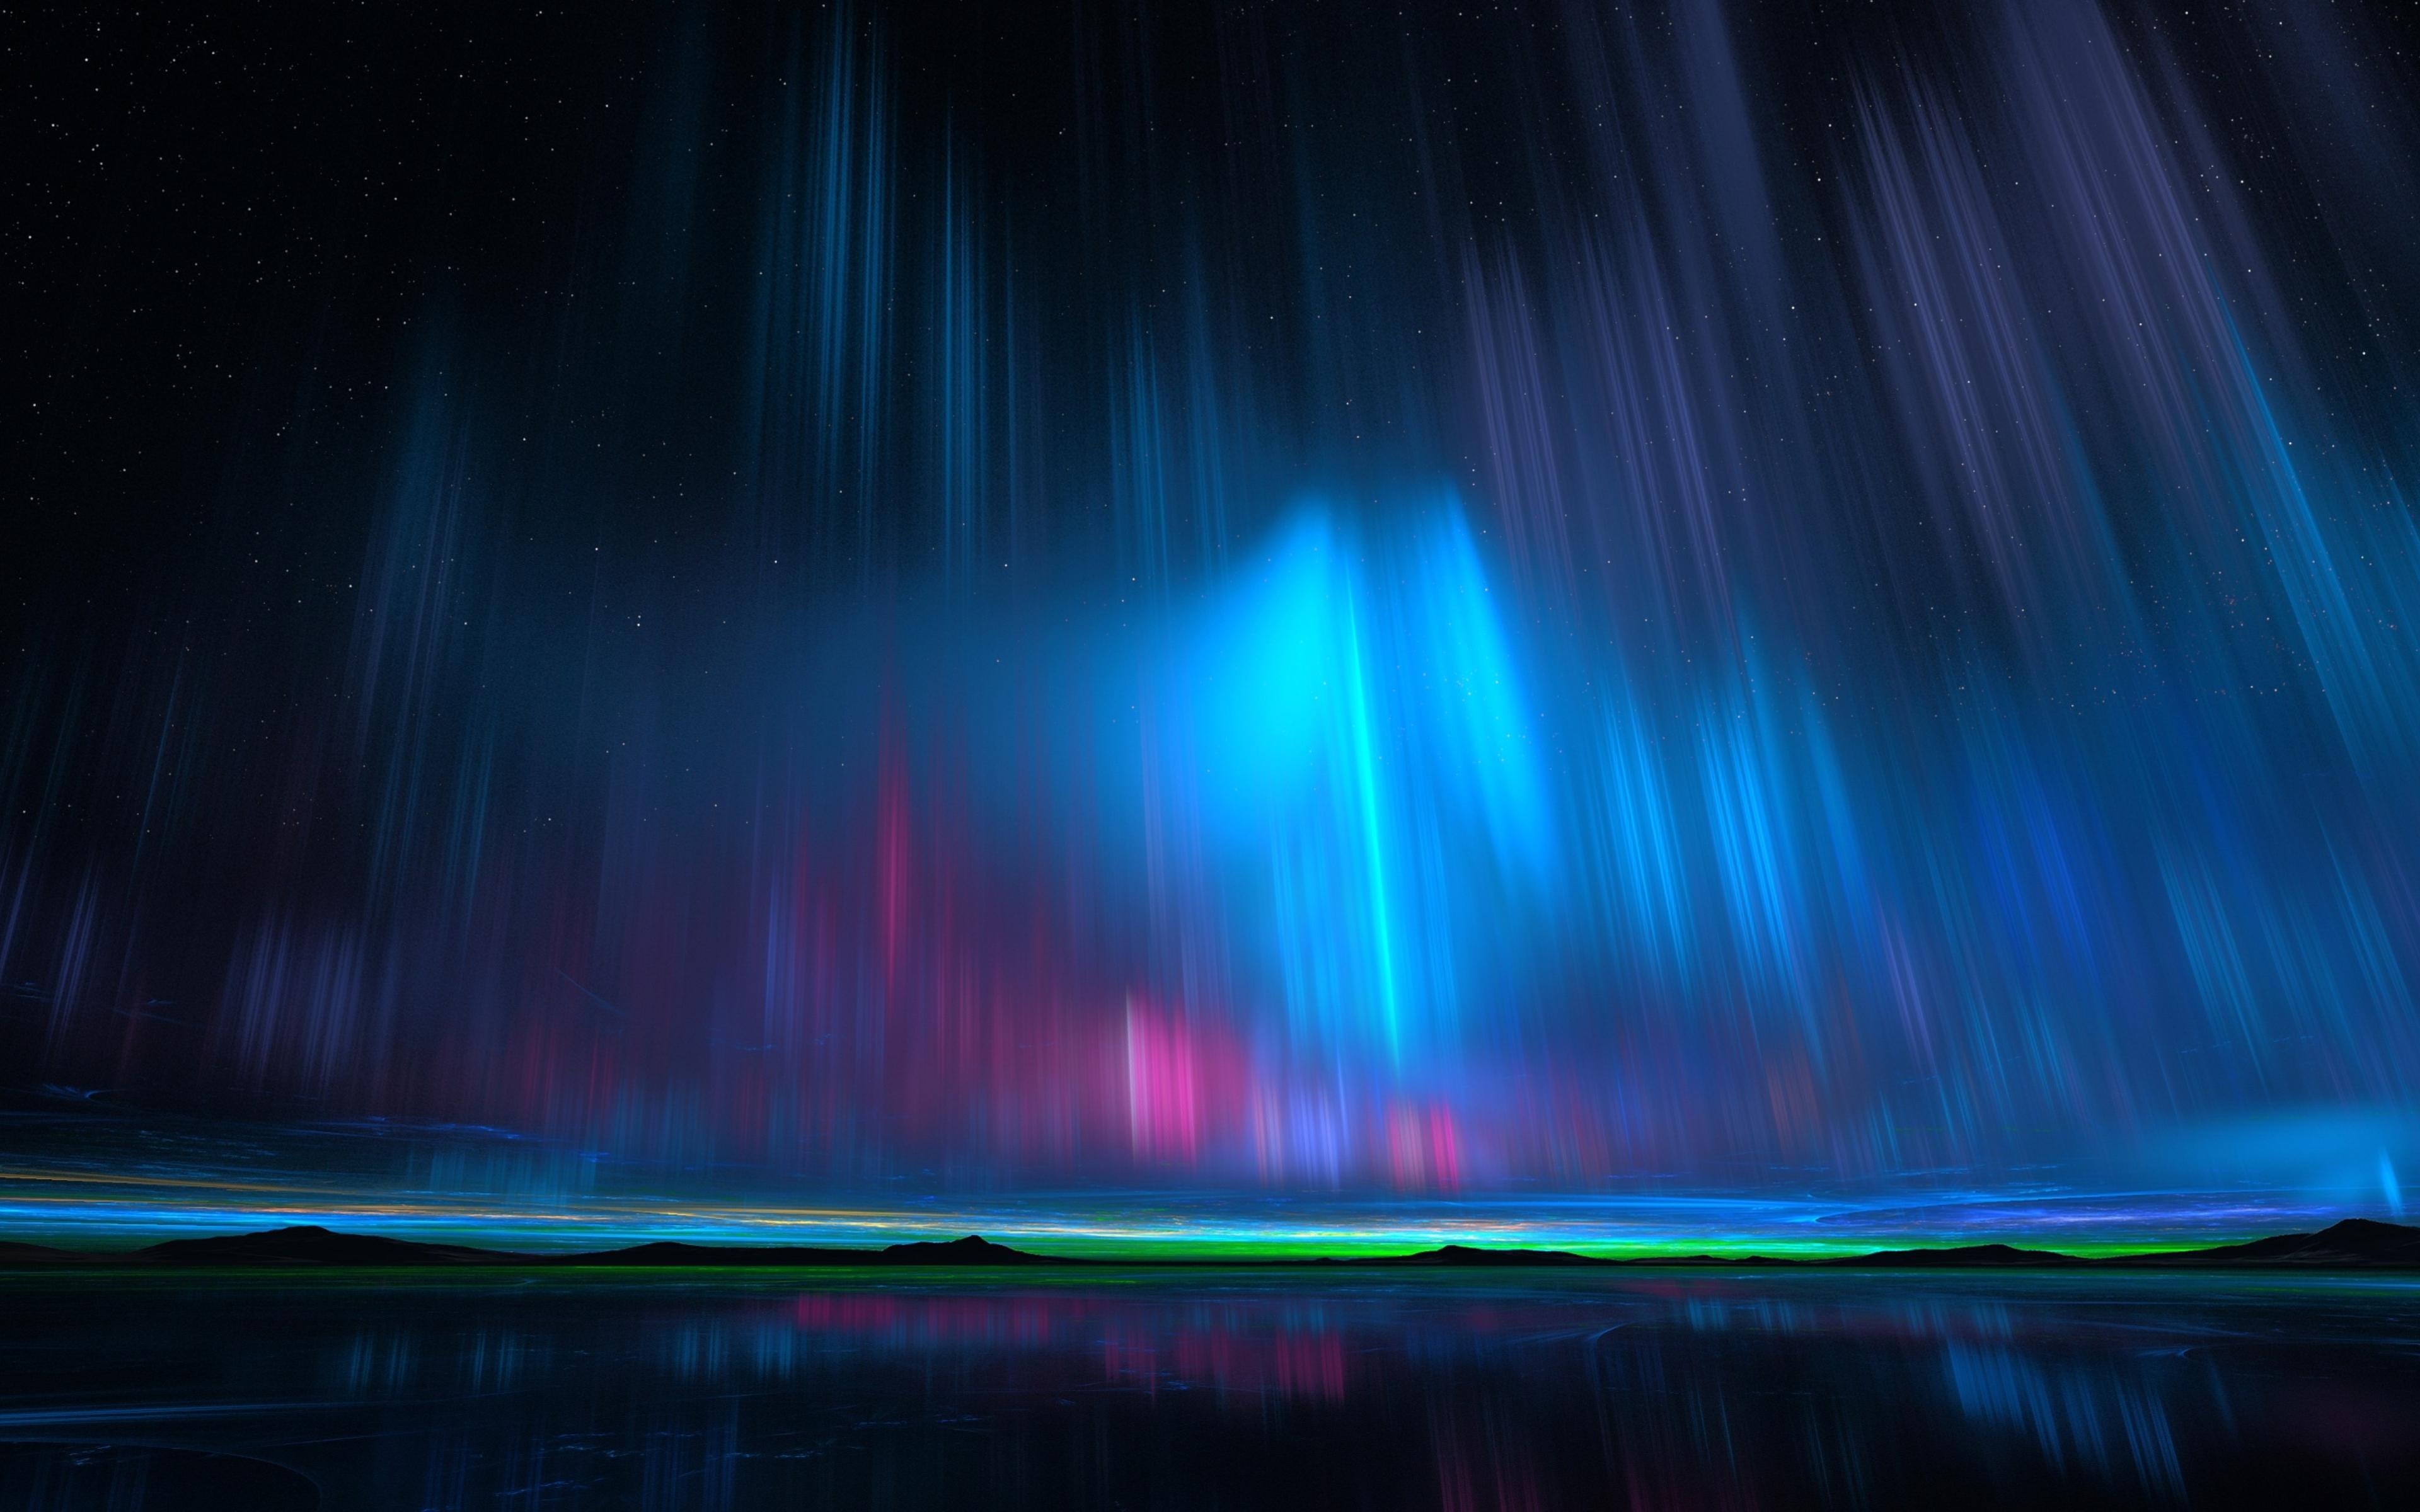 aurora borealis hd 4k wallpaper